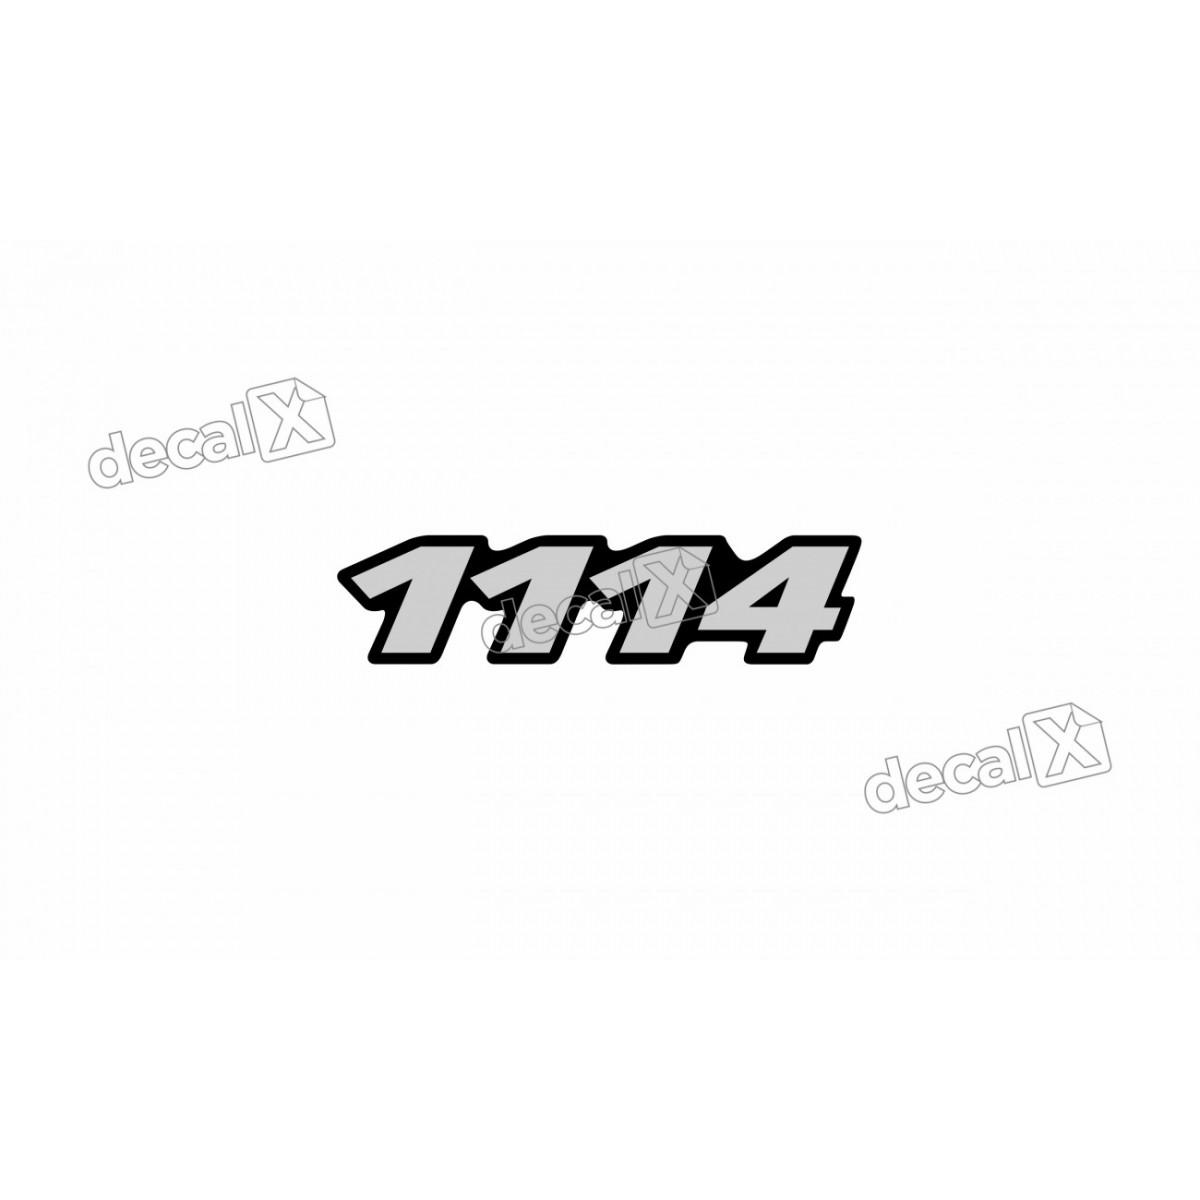 Adesivo Emblema Resinado Mercedes 1114 Cm17 Decalx